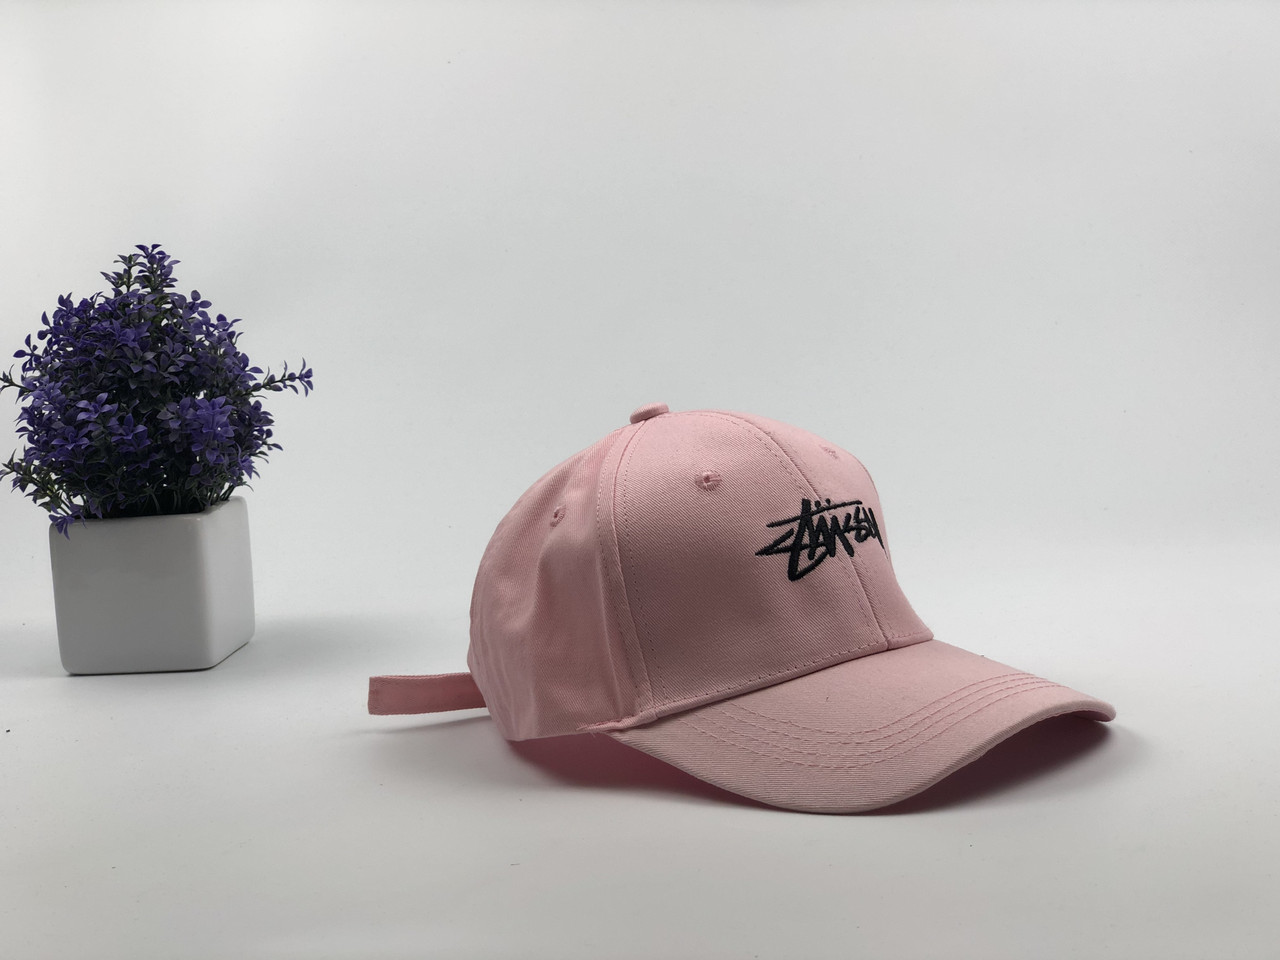 Кепка бейсболка Stussy (розовая)